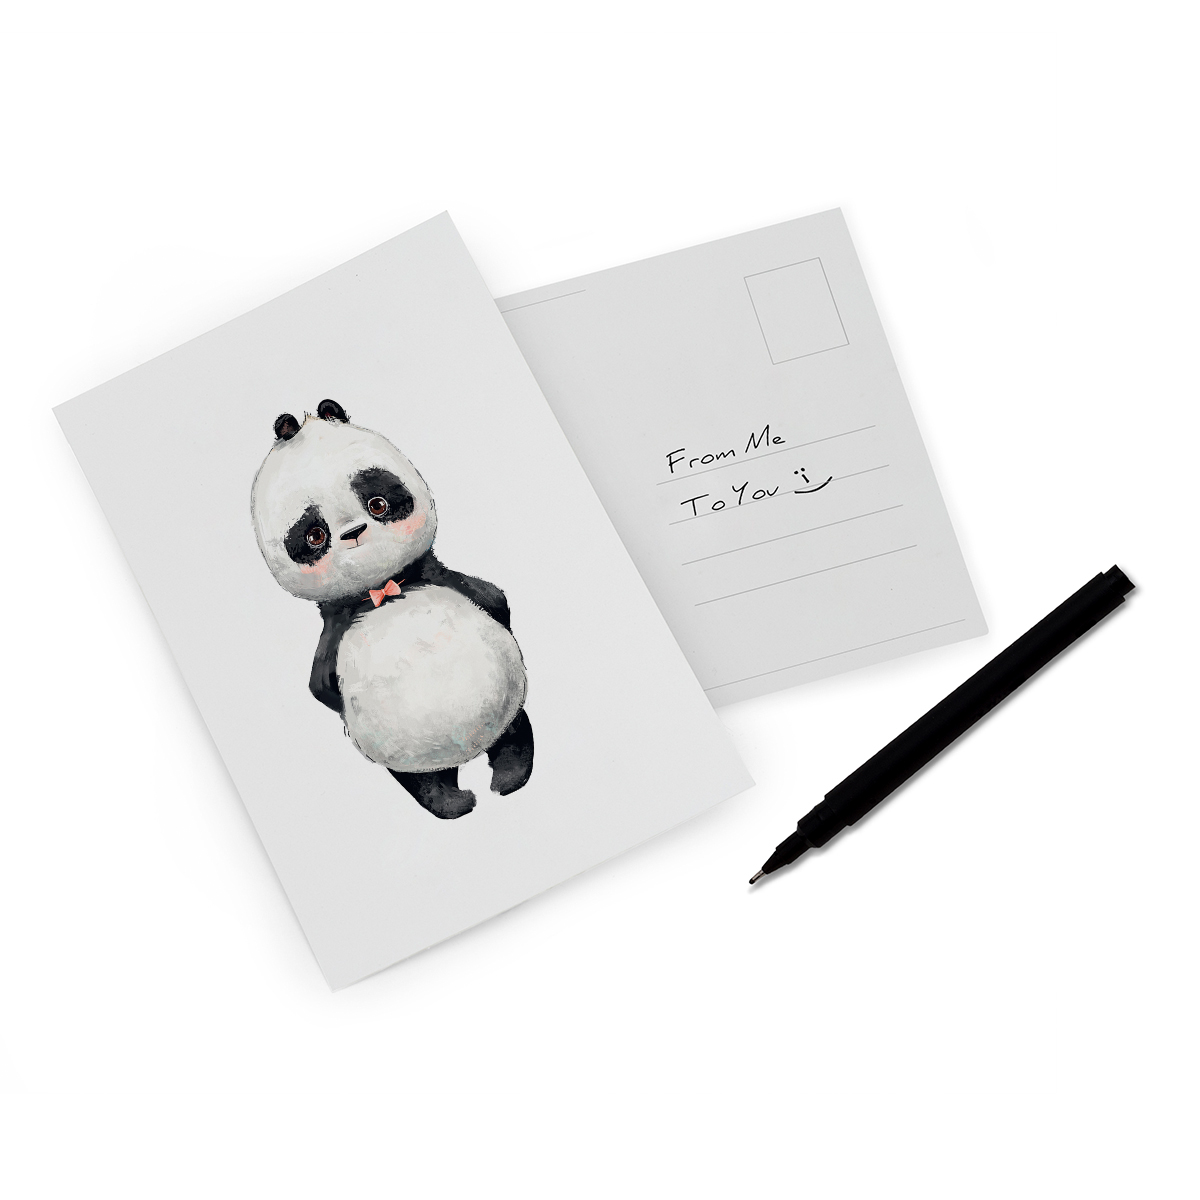 Playful Panda Bowtie Art Cards Incado